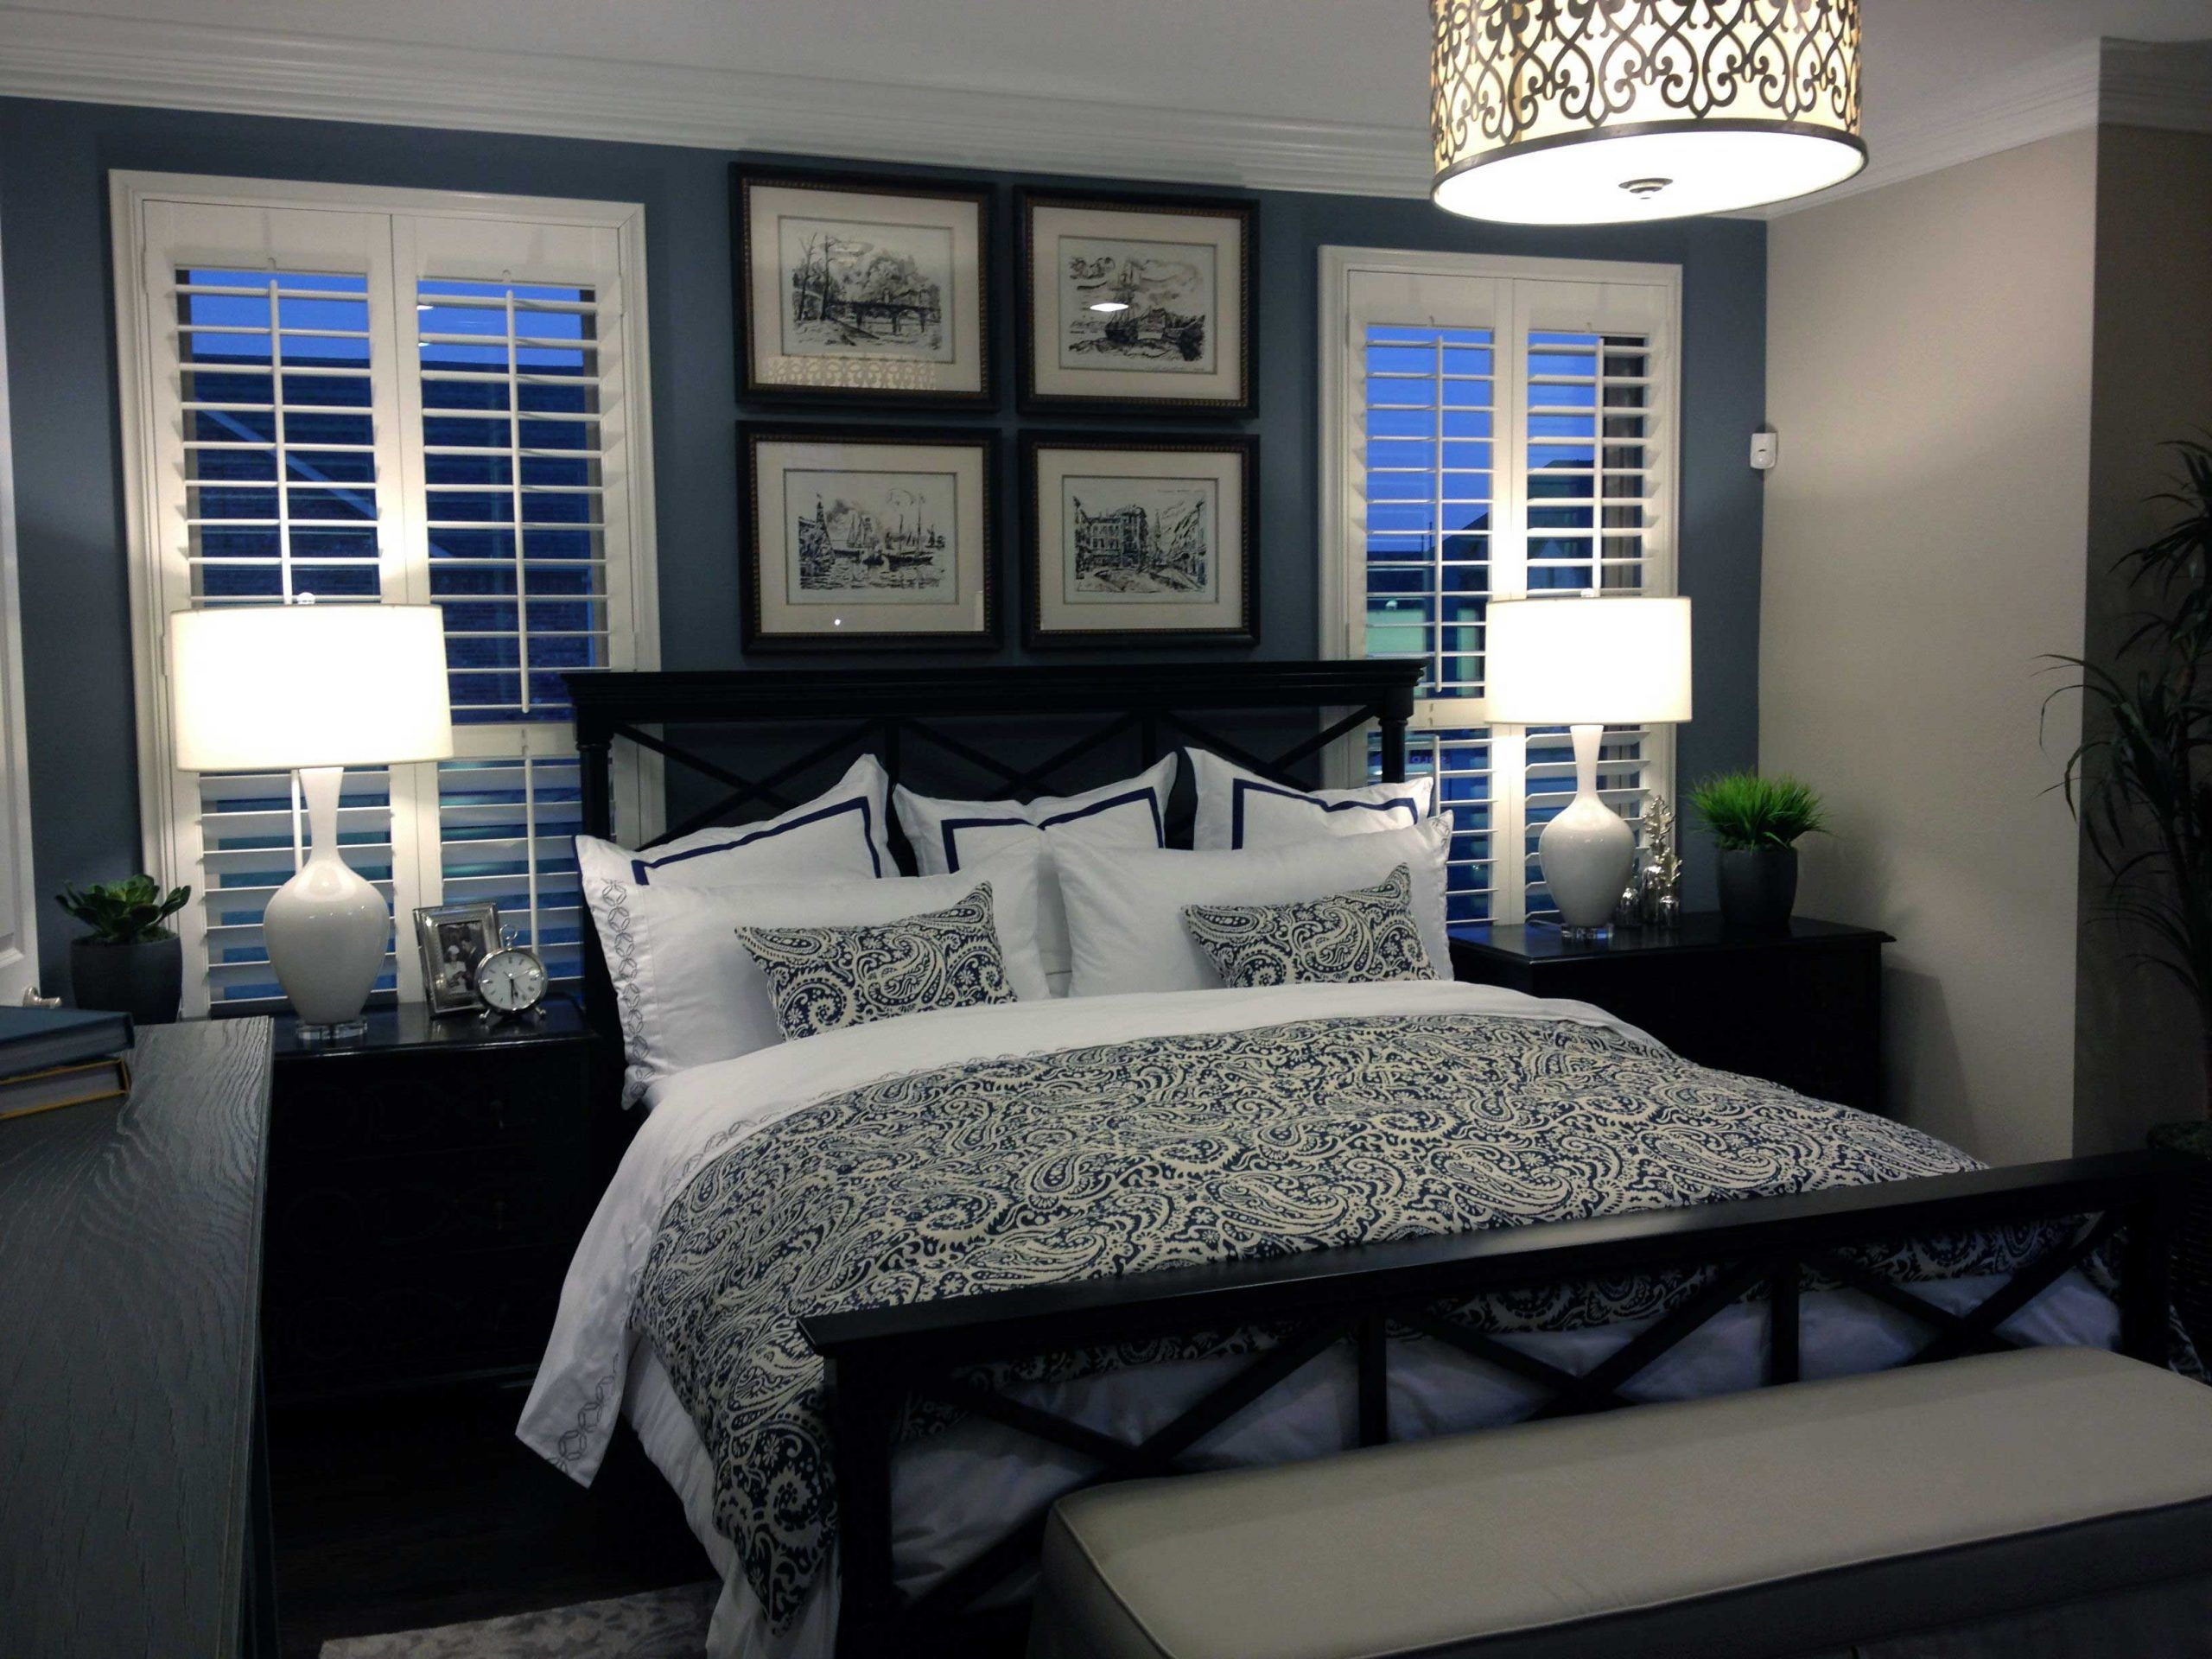 39 Admirable Master Bedroom Ideas With Dark Furniture Plans Futon Living Room White Futon Living Room Windows